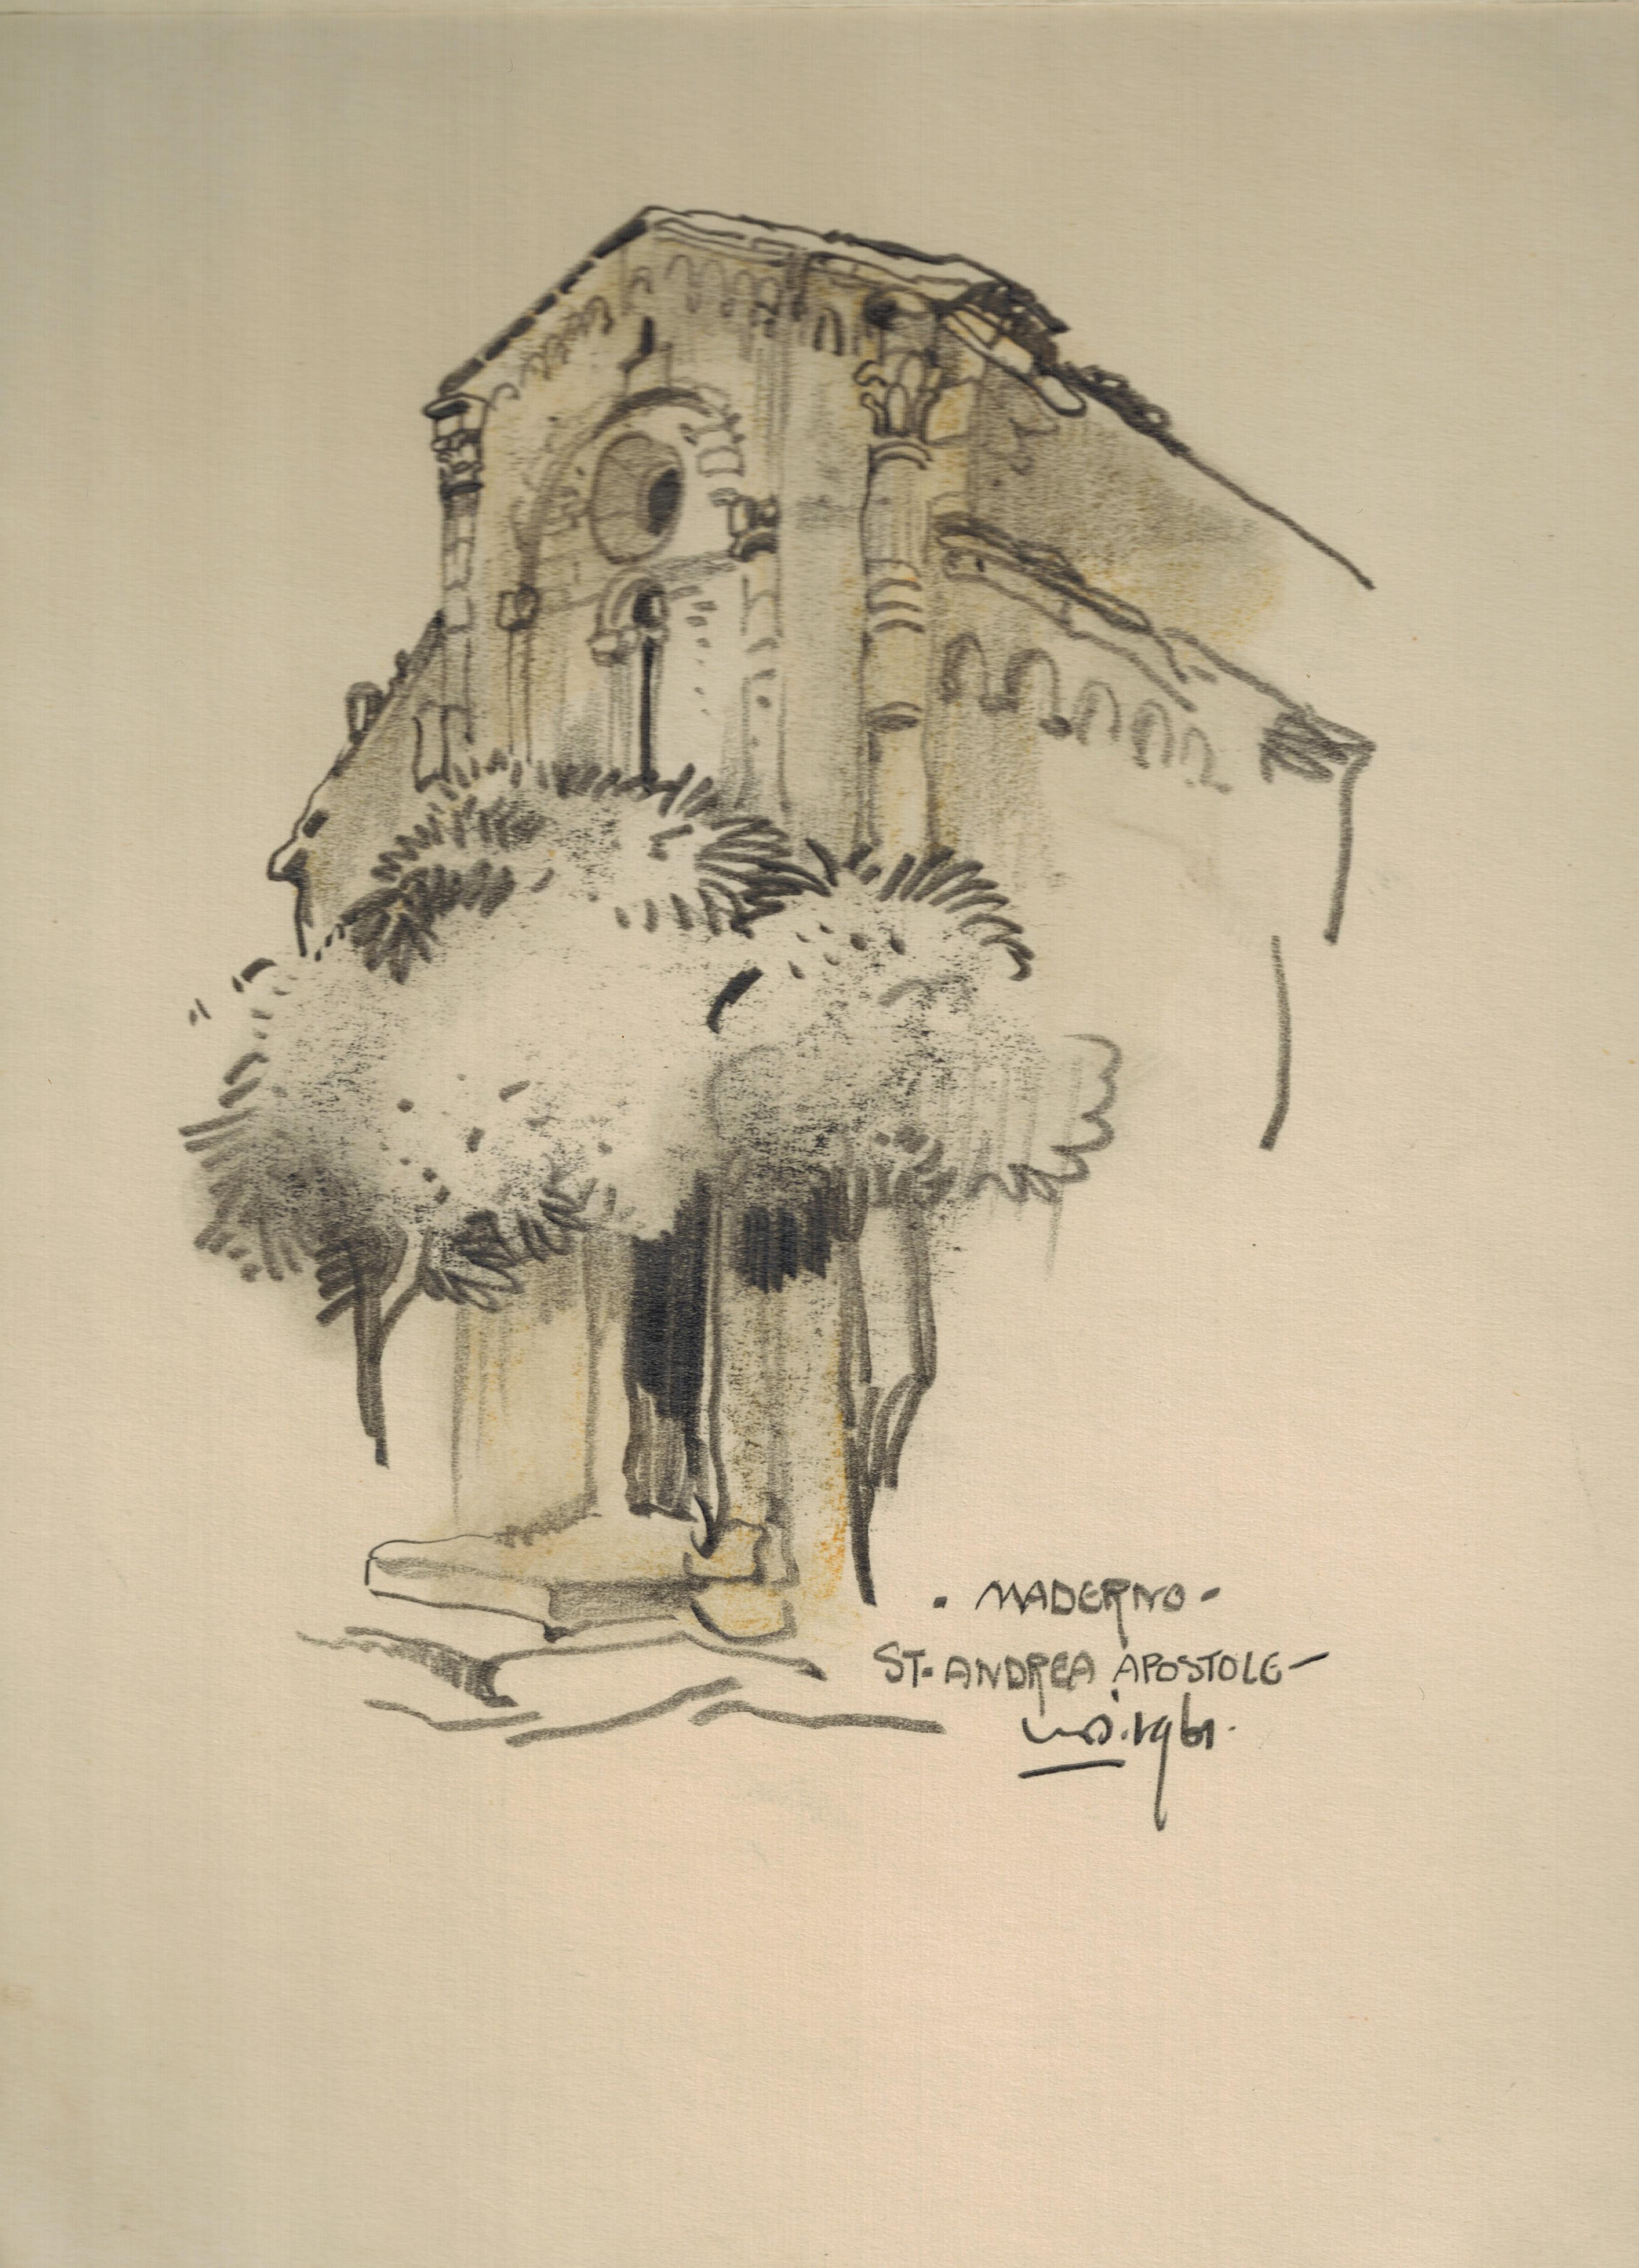 Maderno St. Andrea Apostolo Lago di Garda Italia- Willem van den Berg